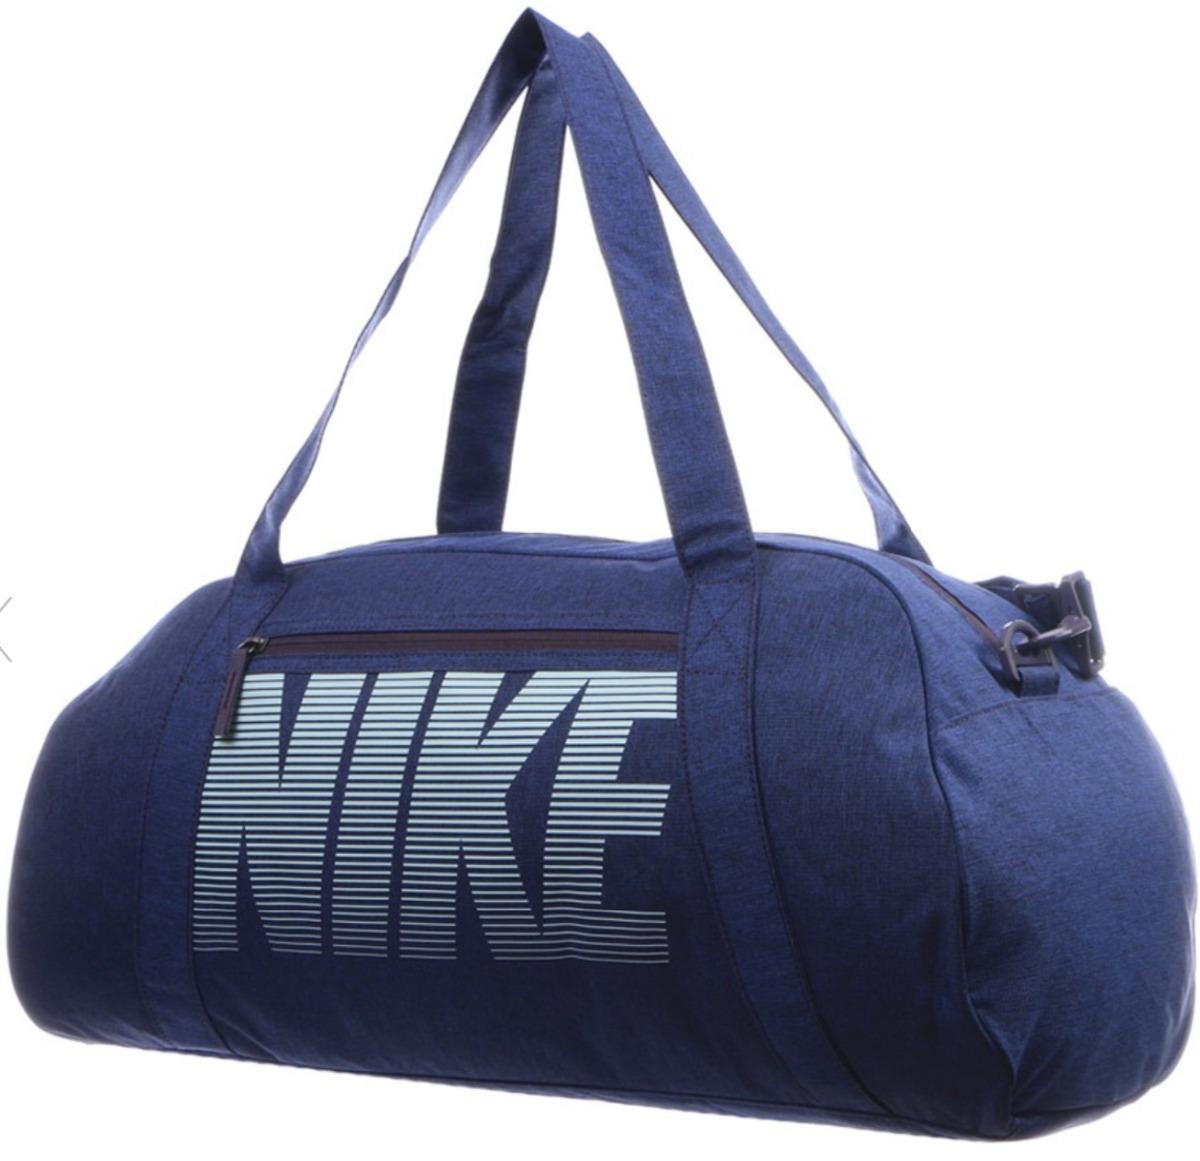 7f491d33a Maleta Nike Dama 00 Gym Cenvio Original 100 Bolso 849 O Mujer rfUERr